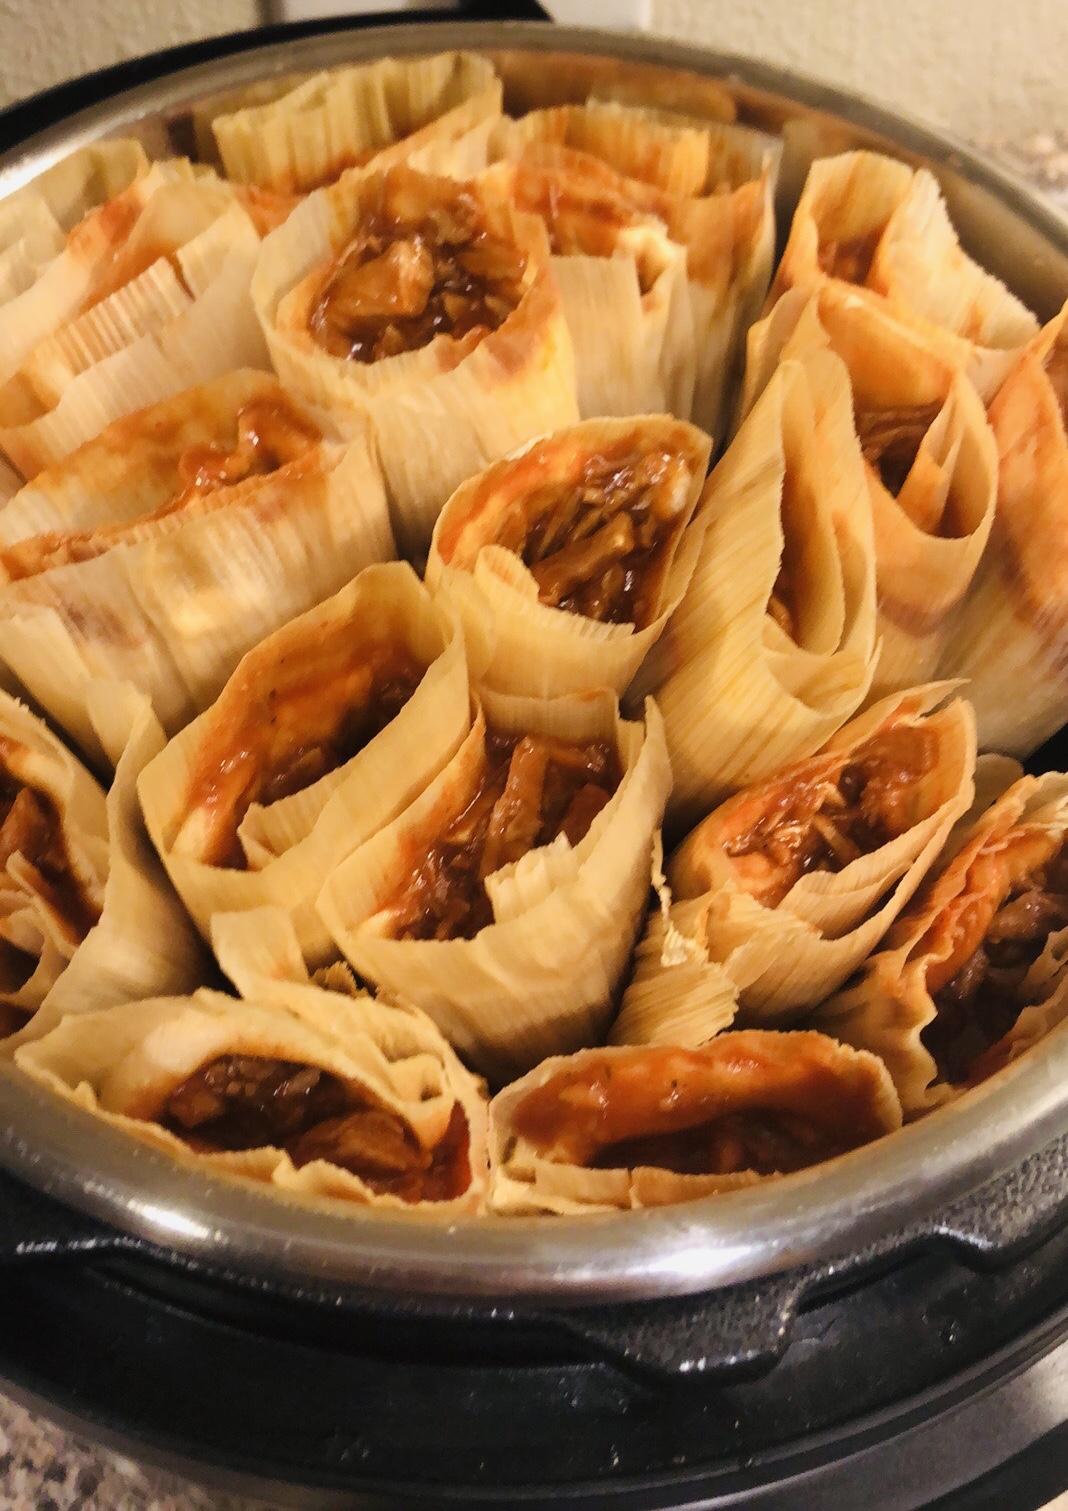 Tamales de Puerco (Red Pork Tamales) chely